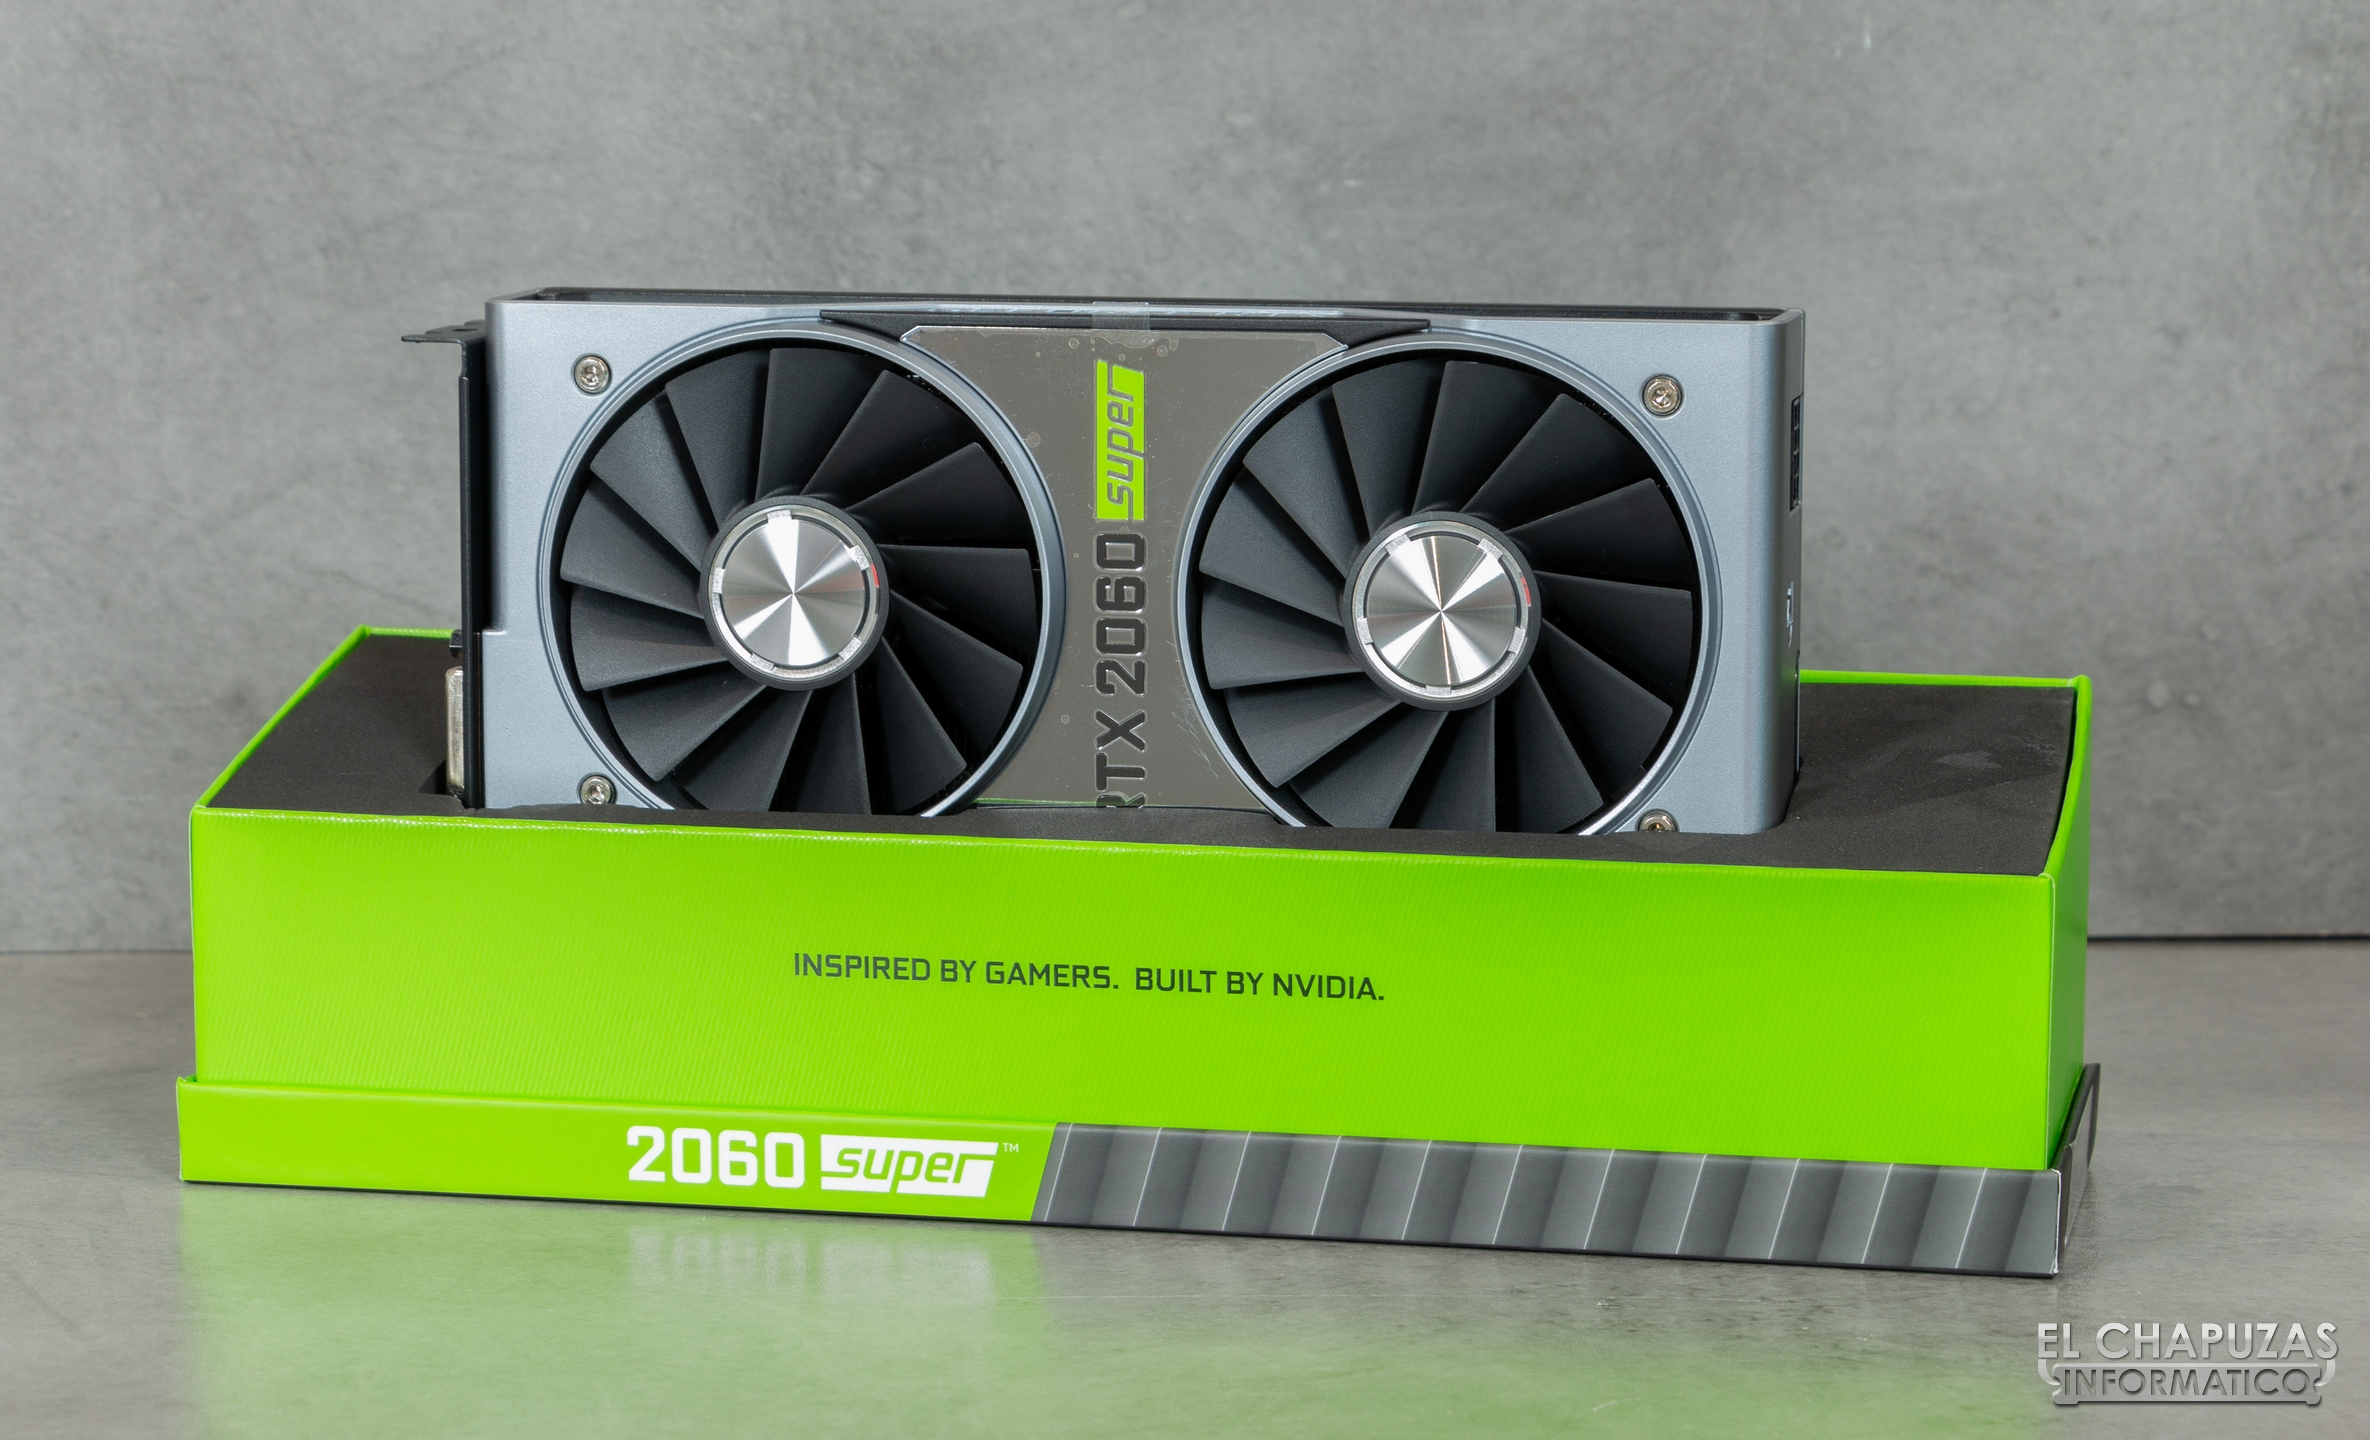 Nvidia reintroduce al mercado las GeForce RTX 2060 y RTX 2060 SUPER